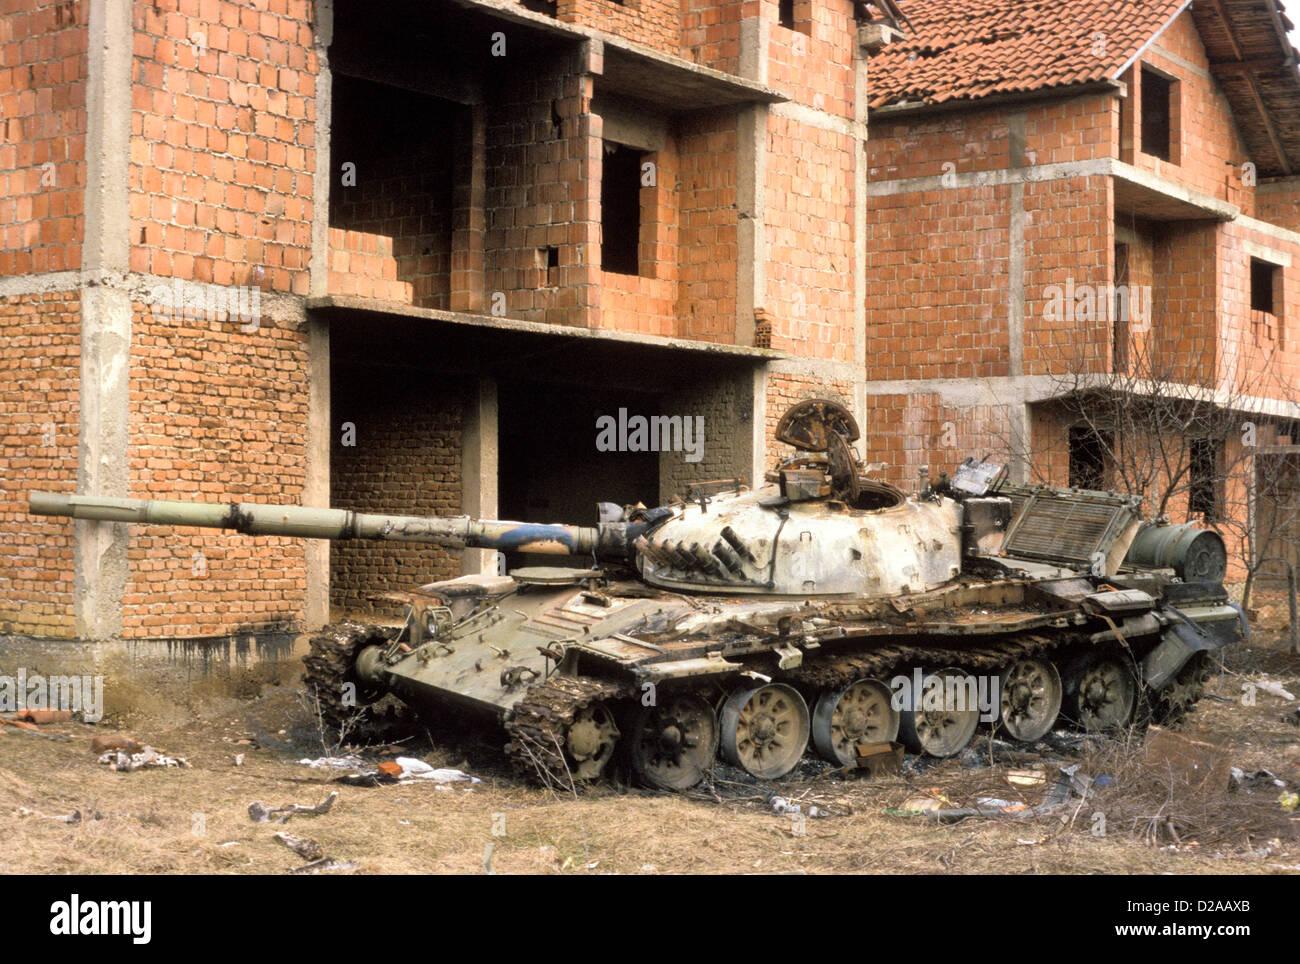 Albania, Kosovo, Peja. Serb Tank And Destroyed Houses.1999 - Stock Image